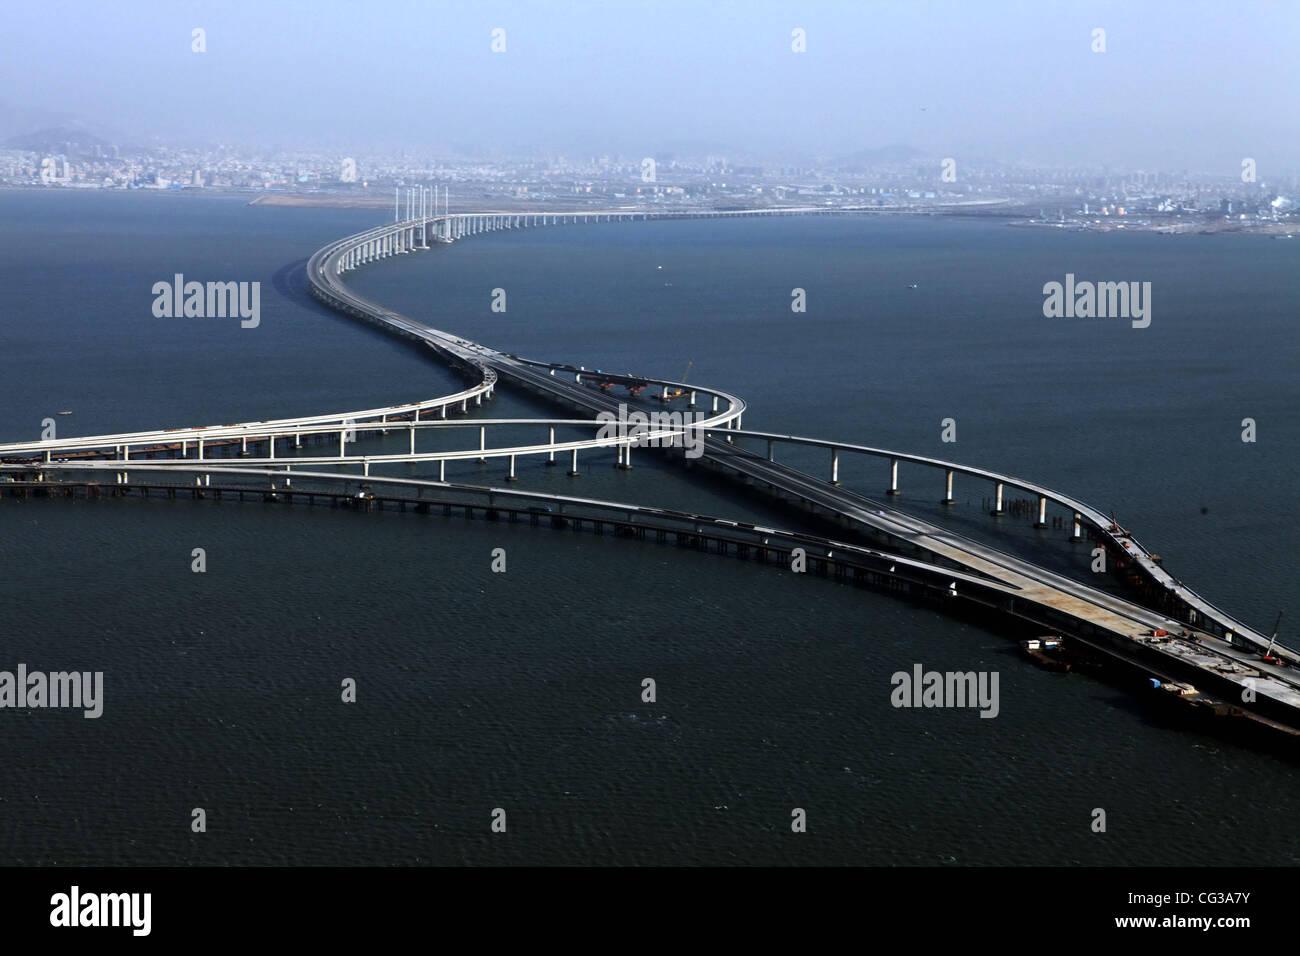 Longest Sea Bridge The Qingdao Haiwan Bridge was completed in Qingdao, Jiaozhou Bay, China on 27 December 27 2010, - Stock Image